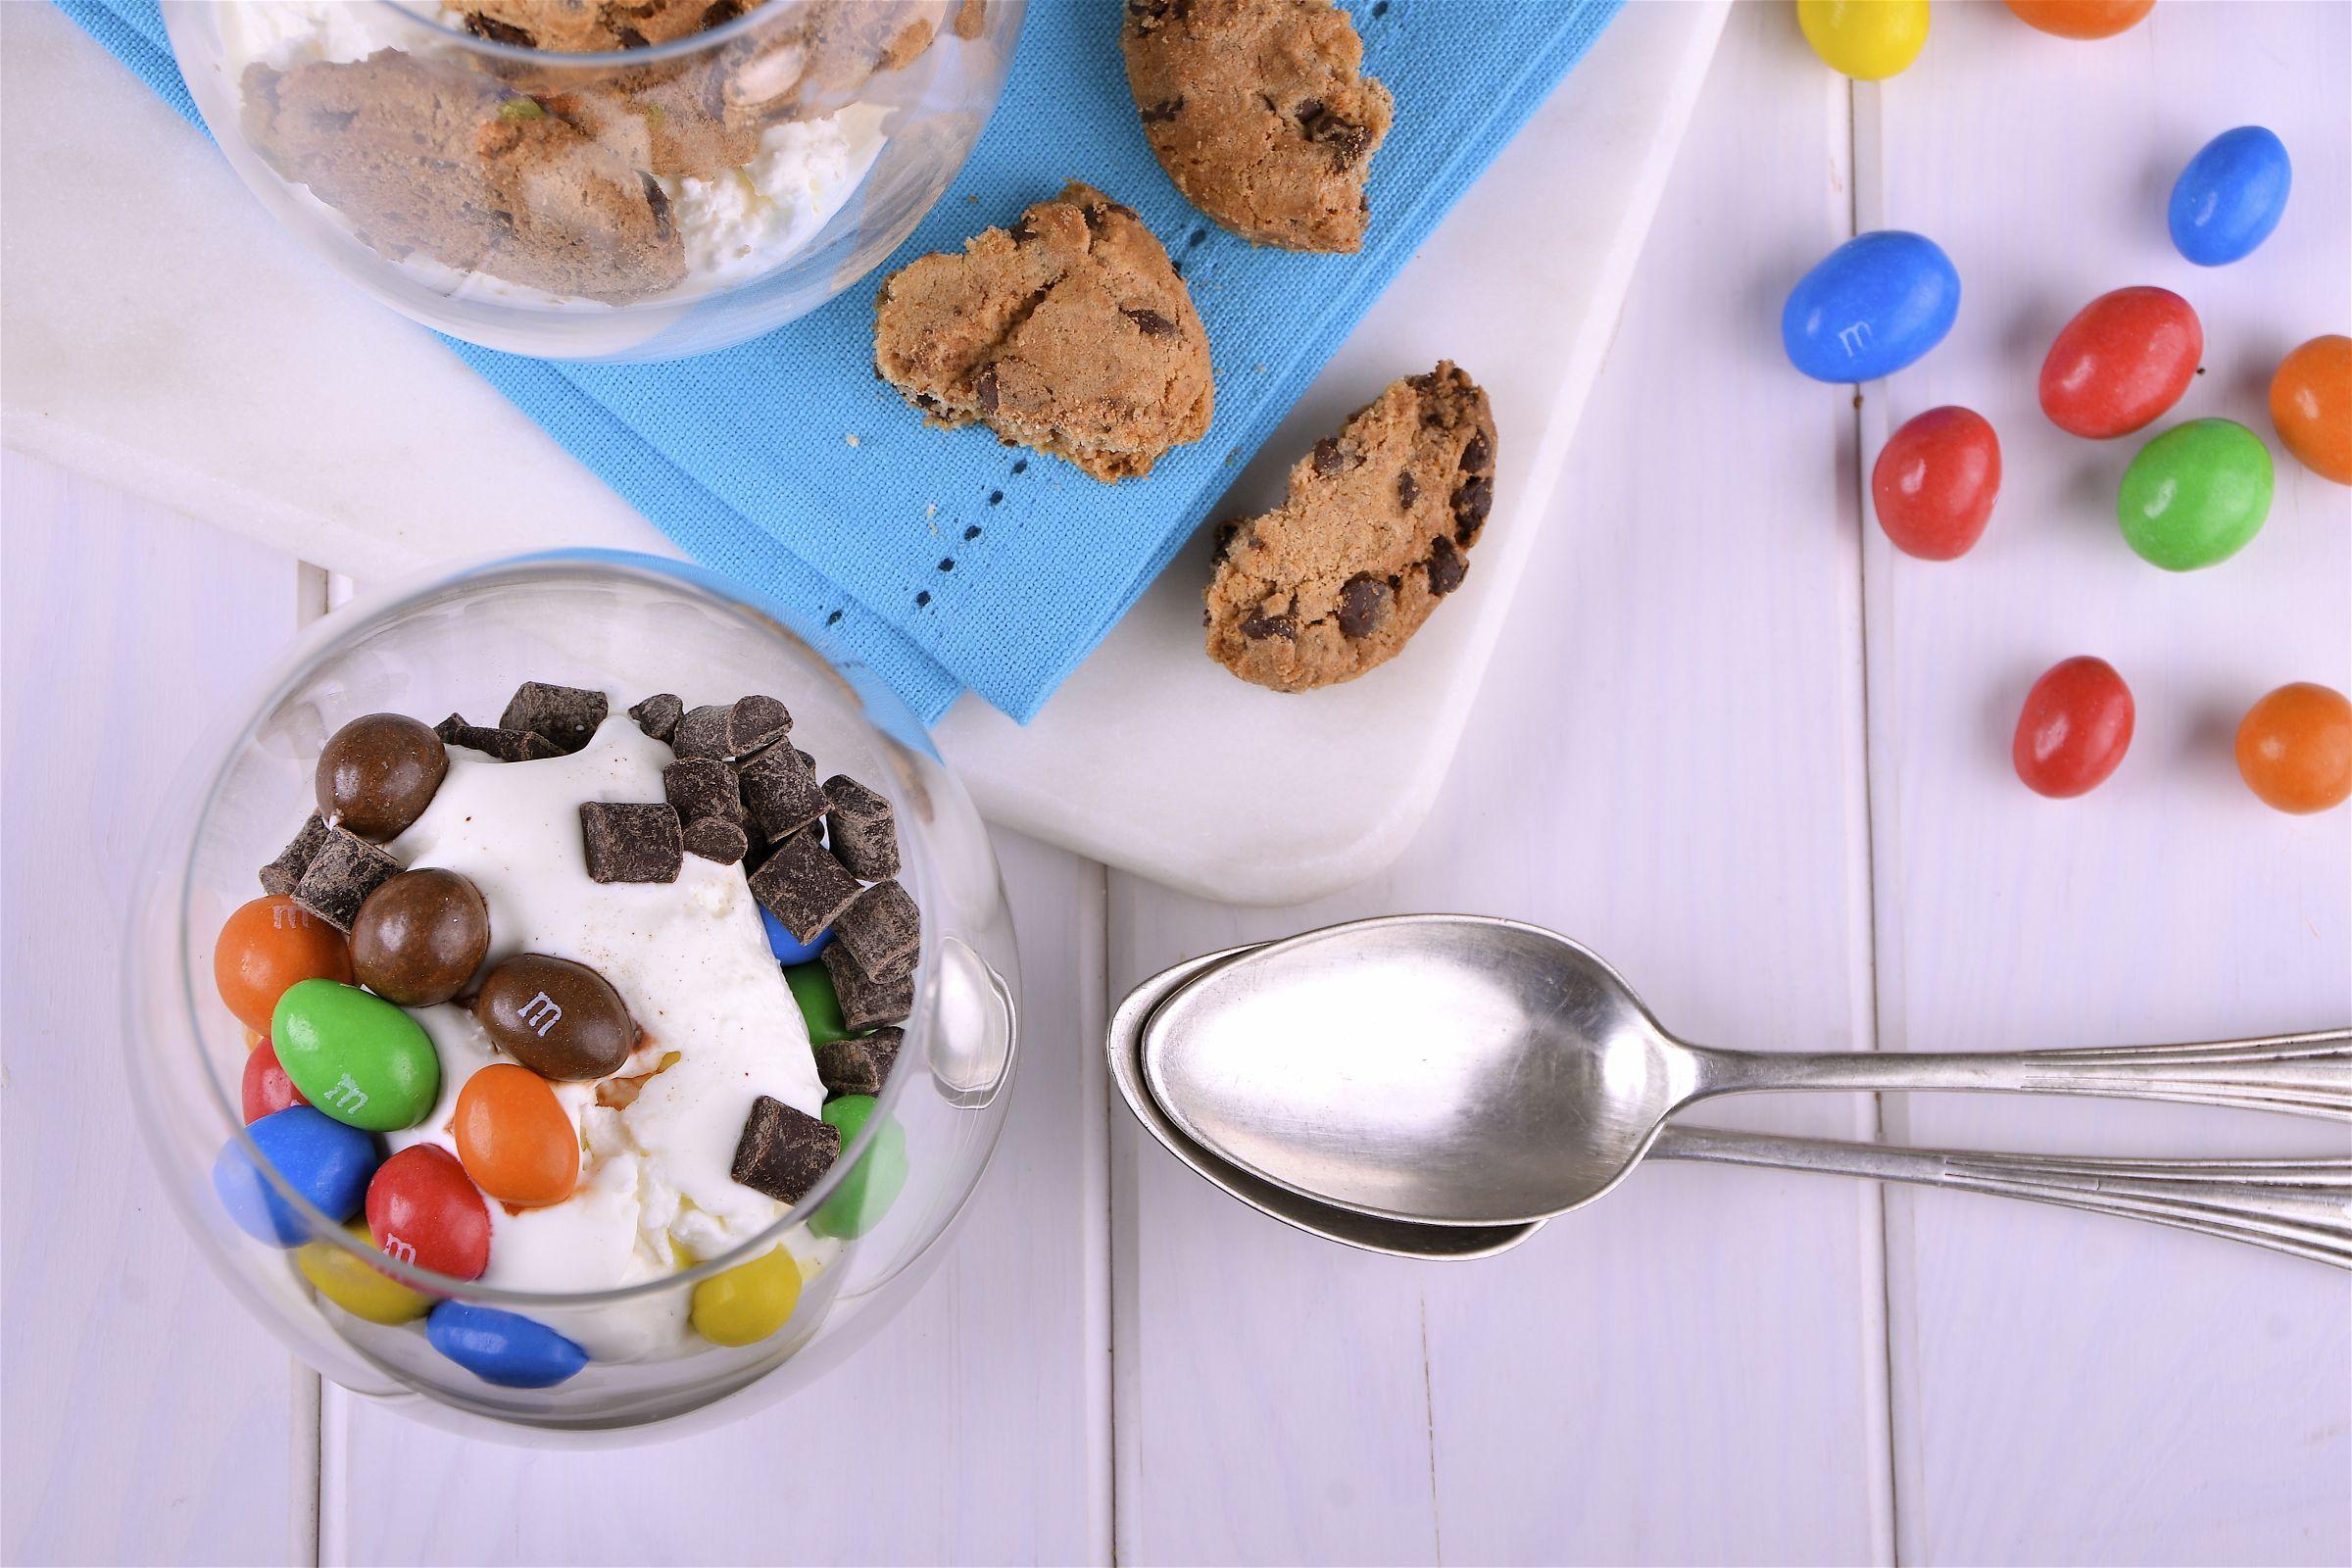 Postre ideal para los niños: crema, yogurt y toppings.  http://elgour.me/1MLq78y  #elgourmet #TuCanalDeCocina #Dulces